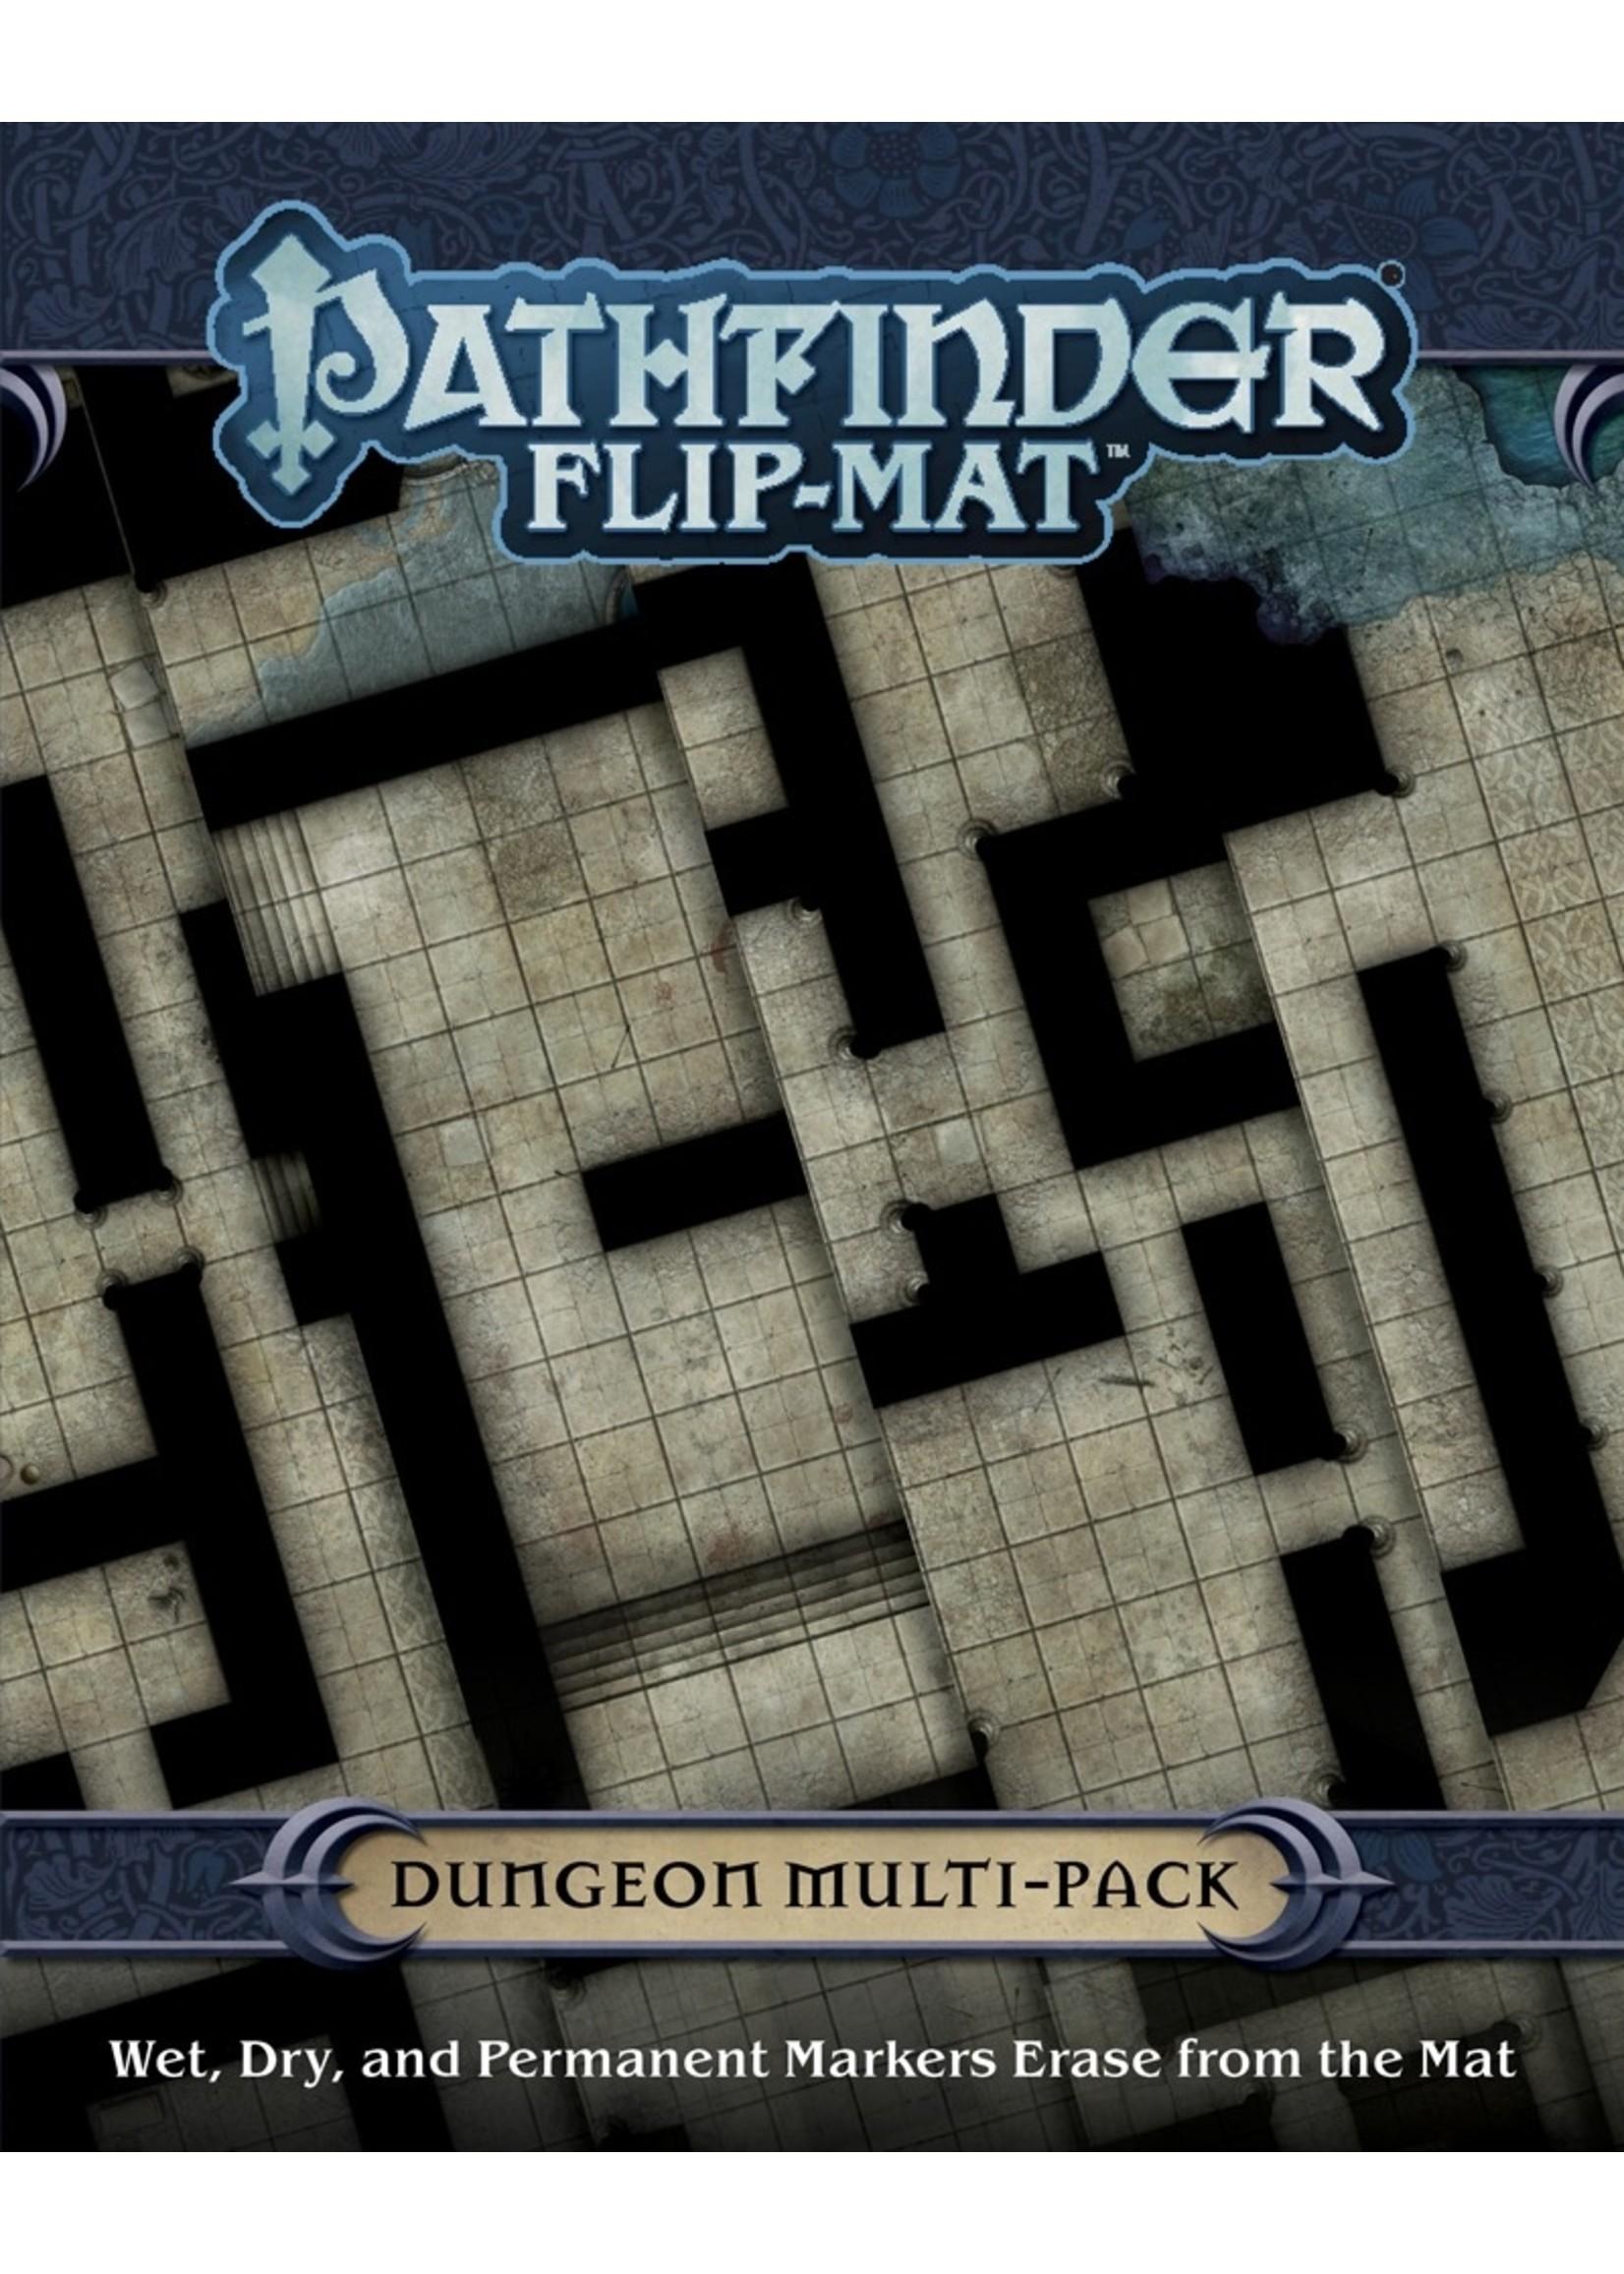 Pathfinder RPG: Flip-Mat - Dungeon Multi-Pack